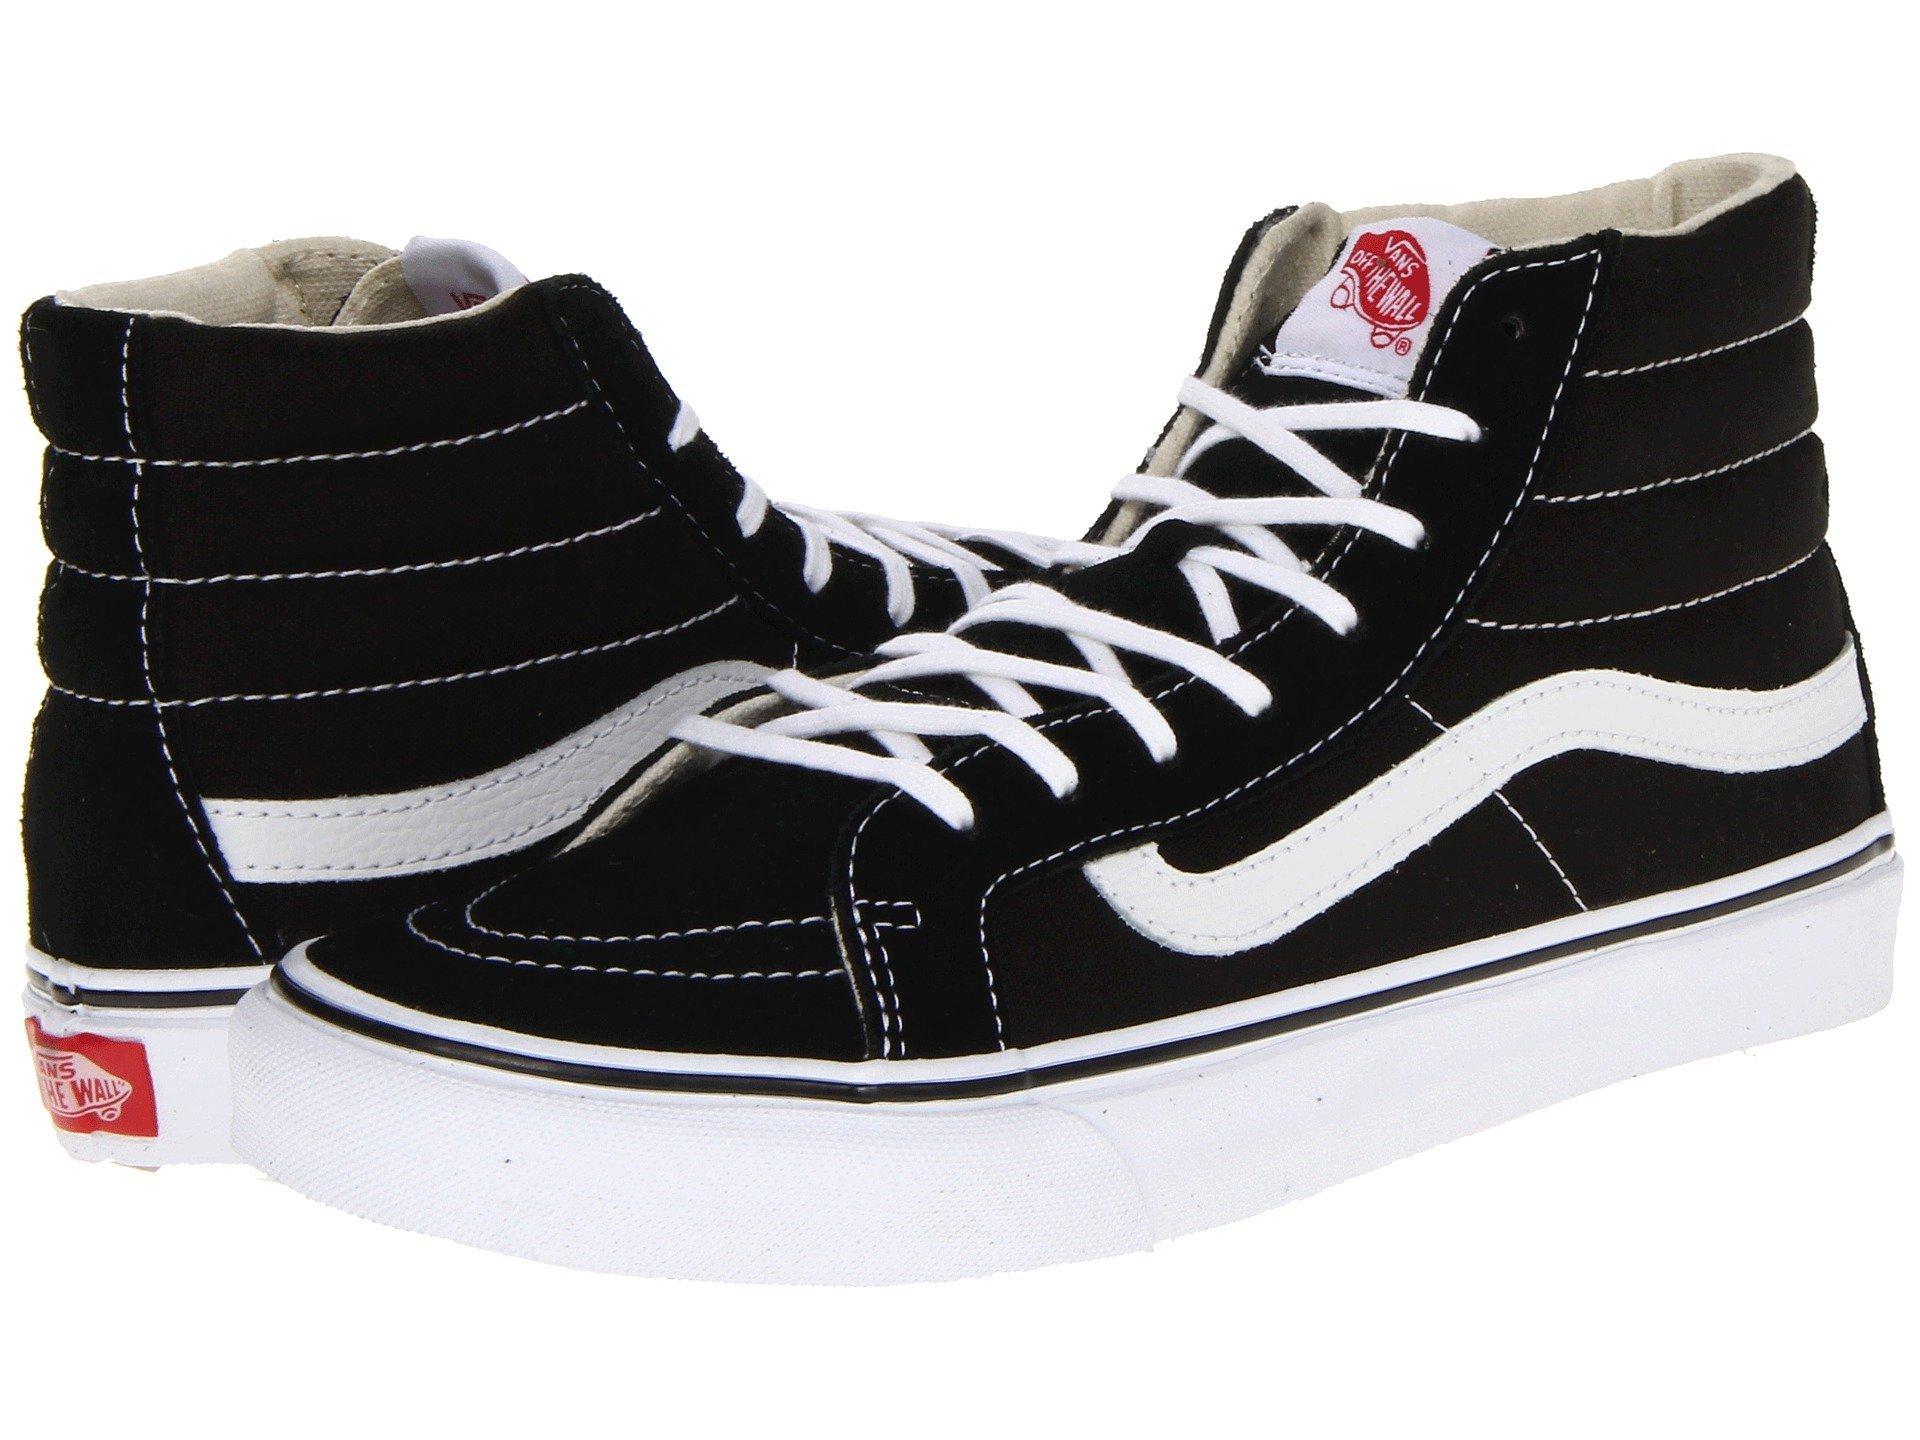 1ee67113a77ede Galleon - Vans Sk8-Hi Unisex Casual High-Top Skate Shoes